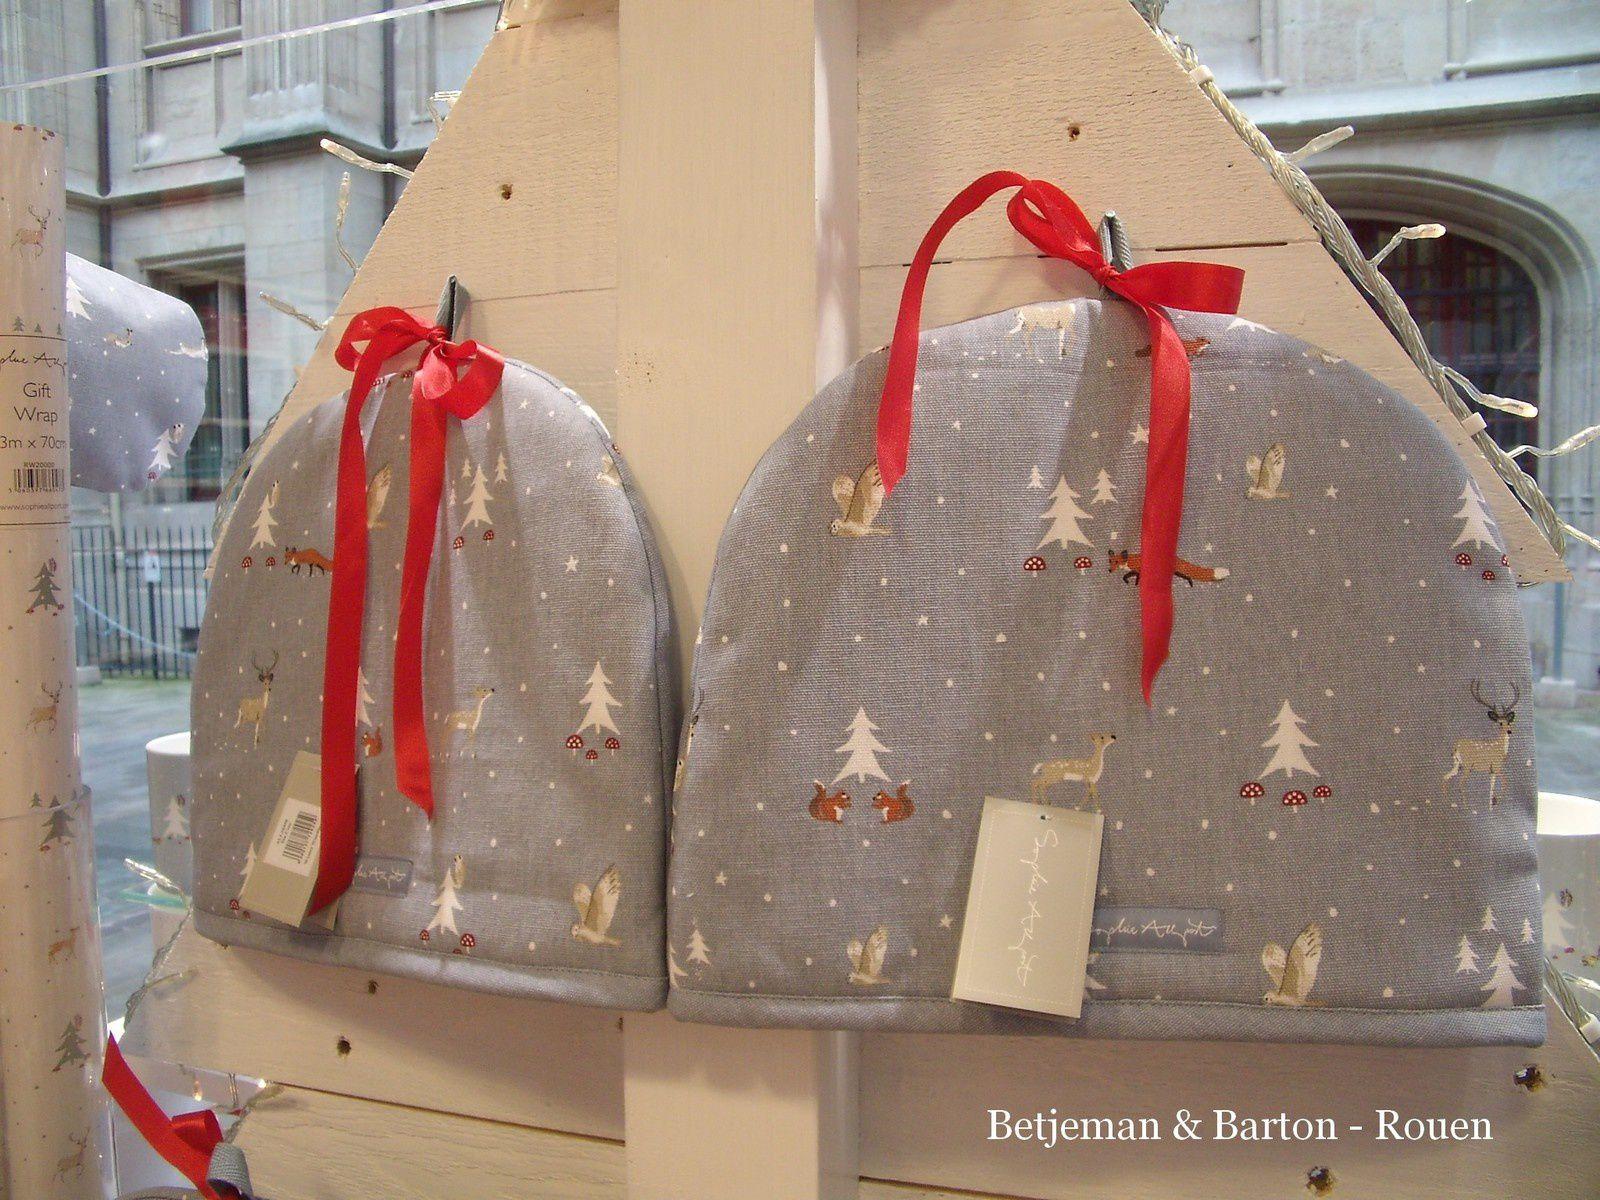 Noël 2014 chez Betjeman and Barton Rouen